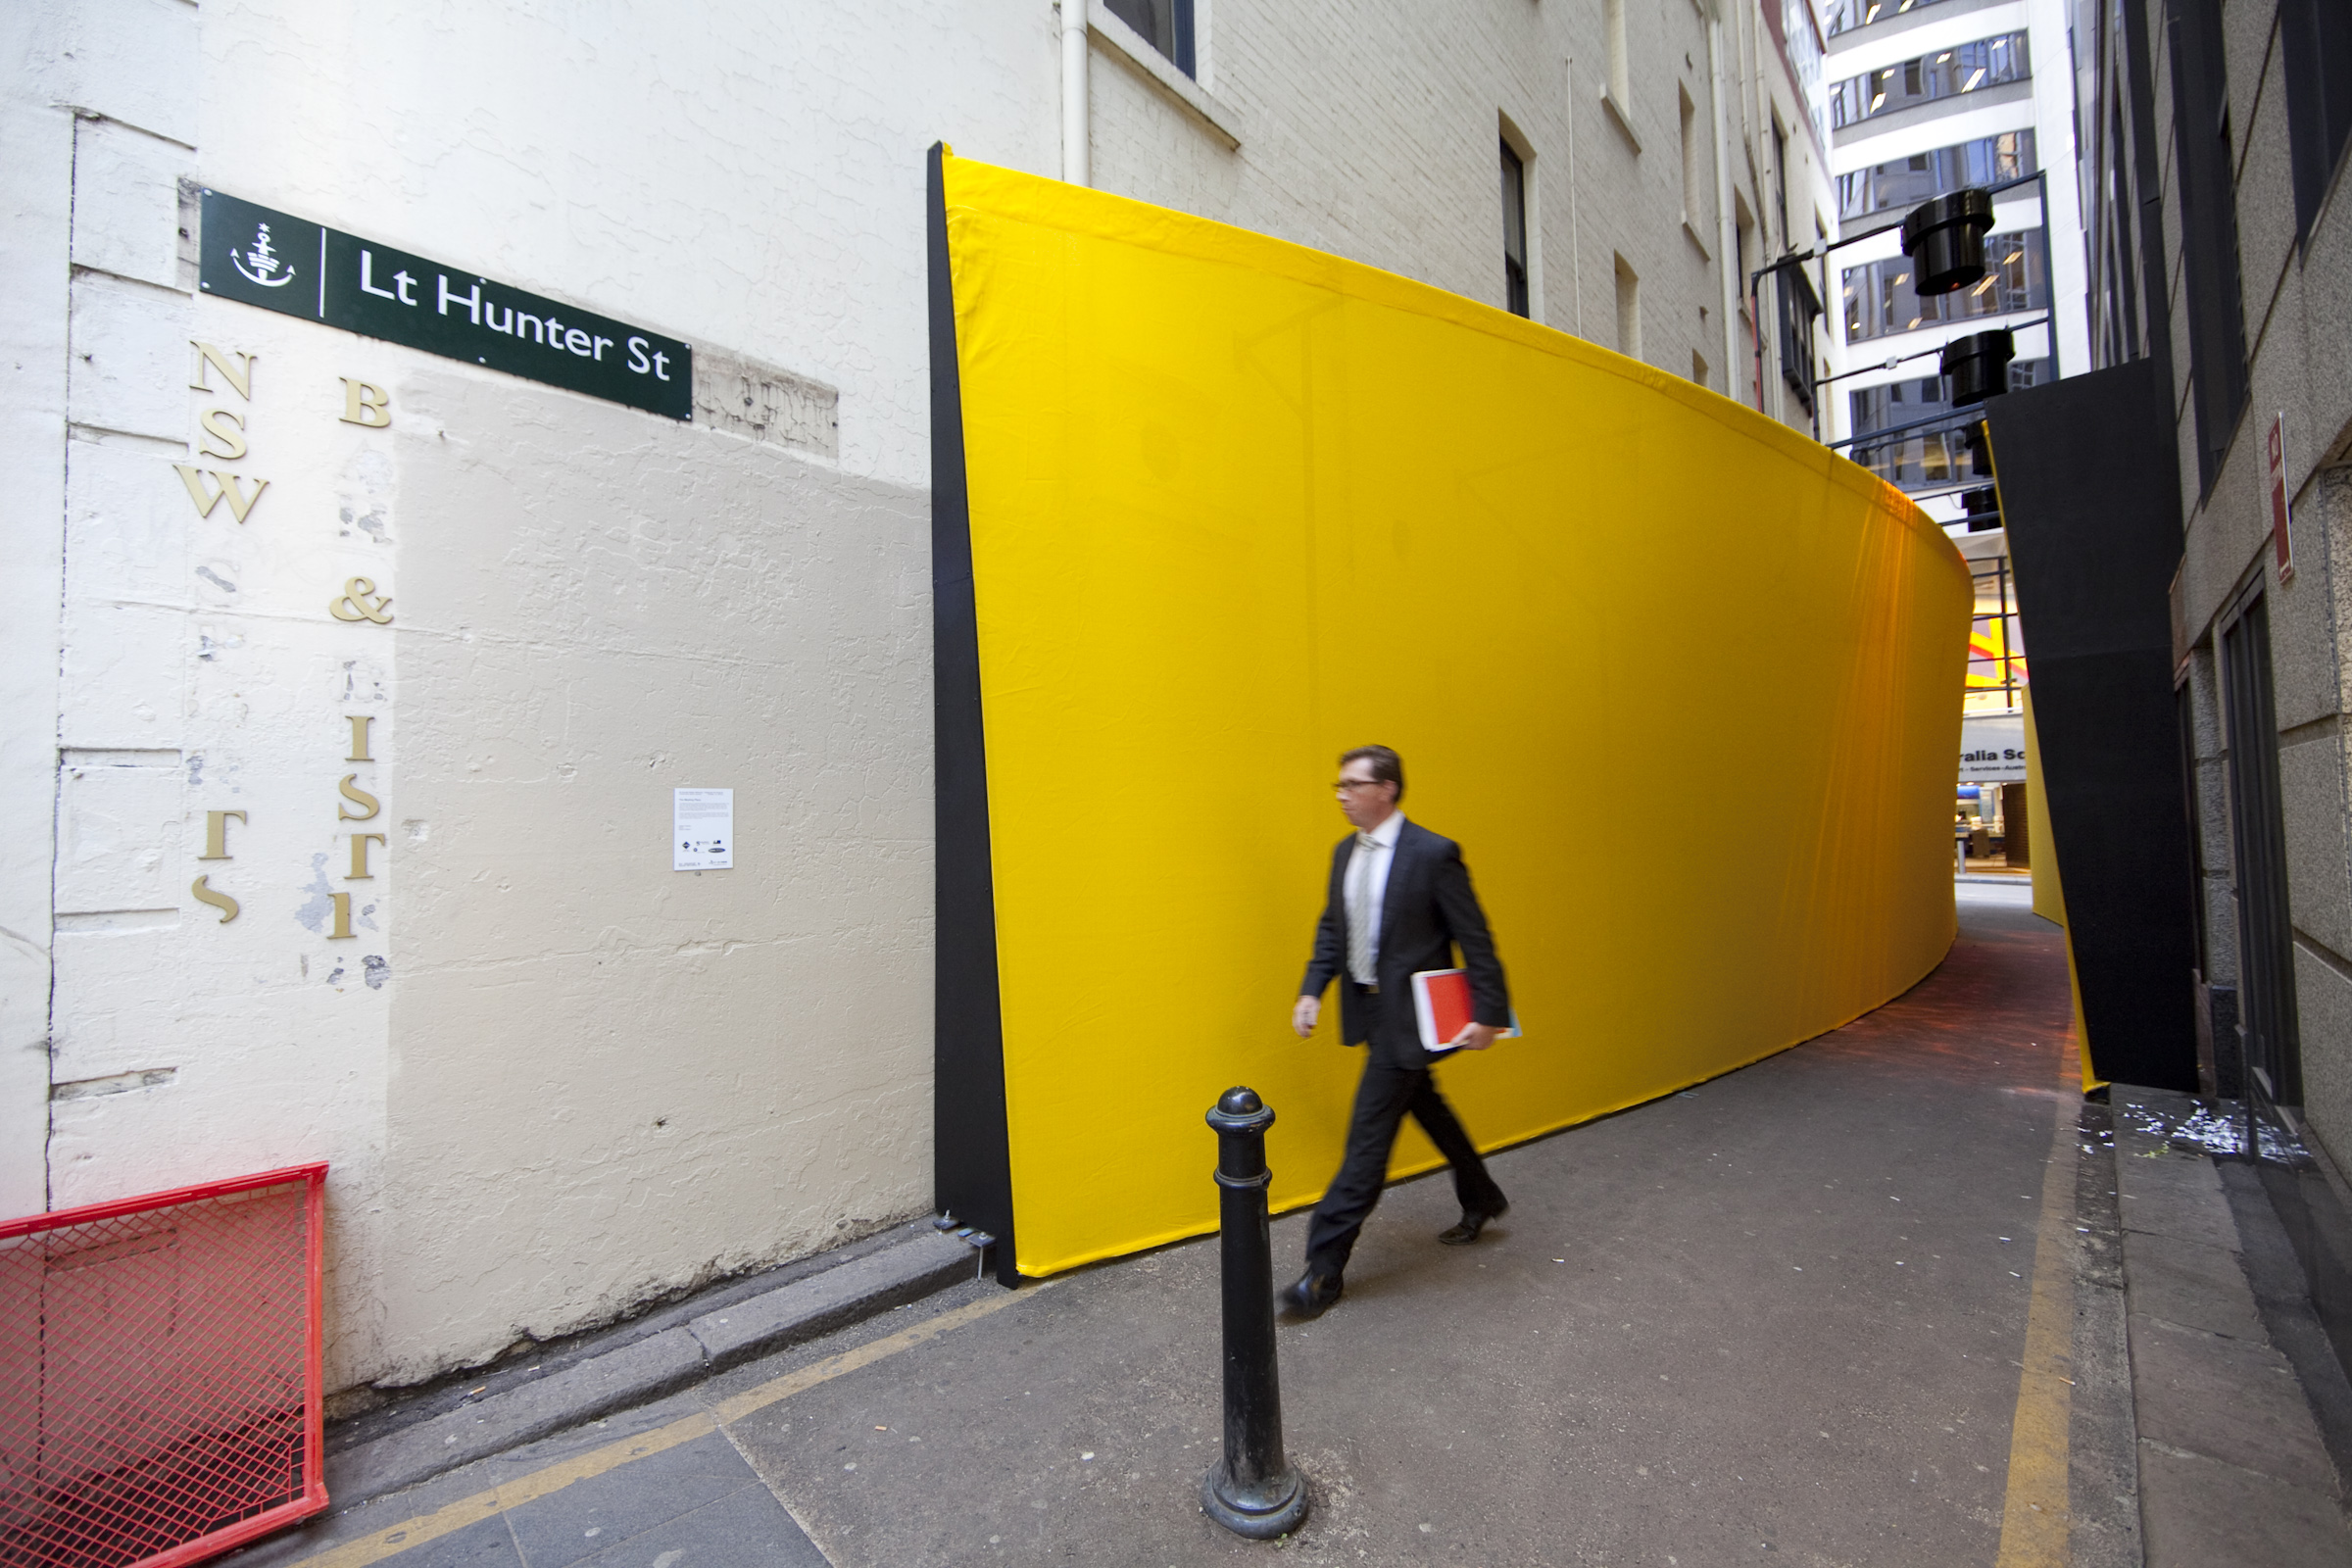 Find an artwork - City Art Sydney